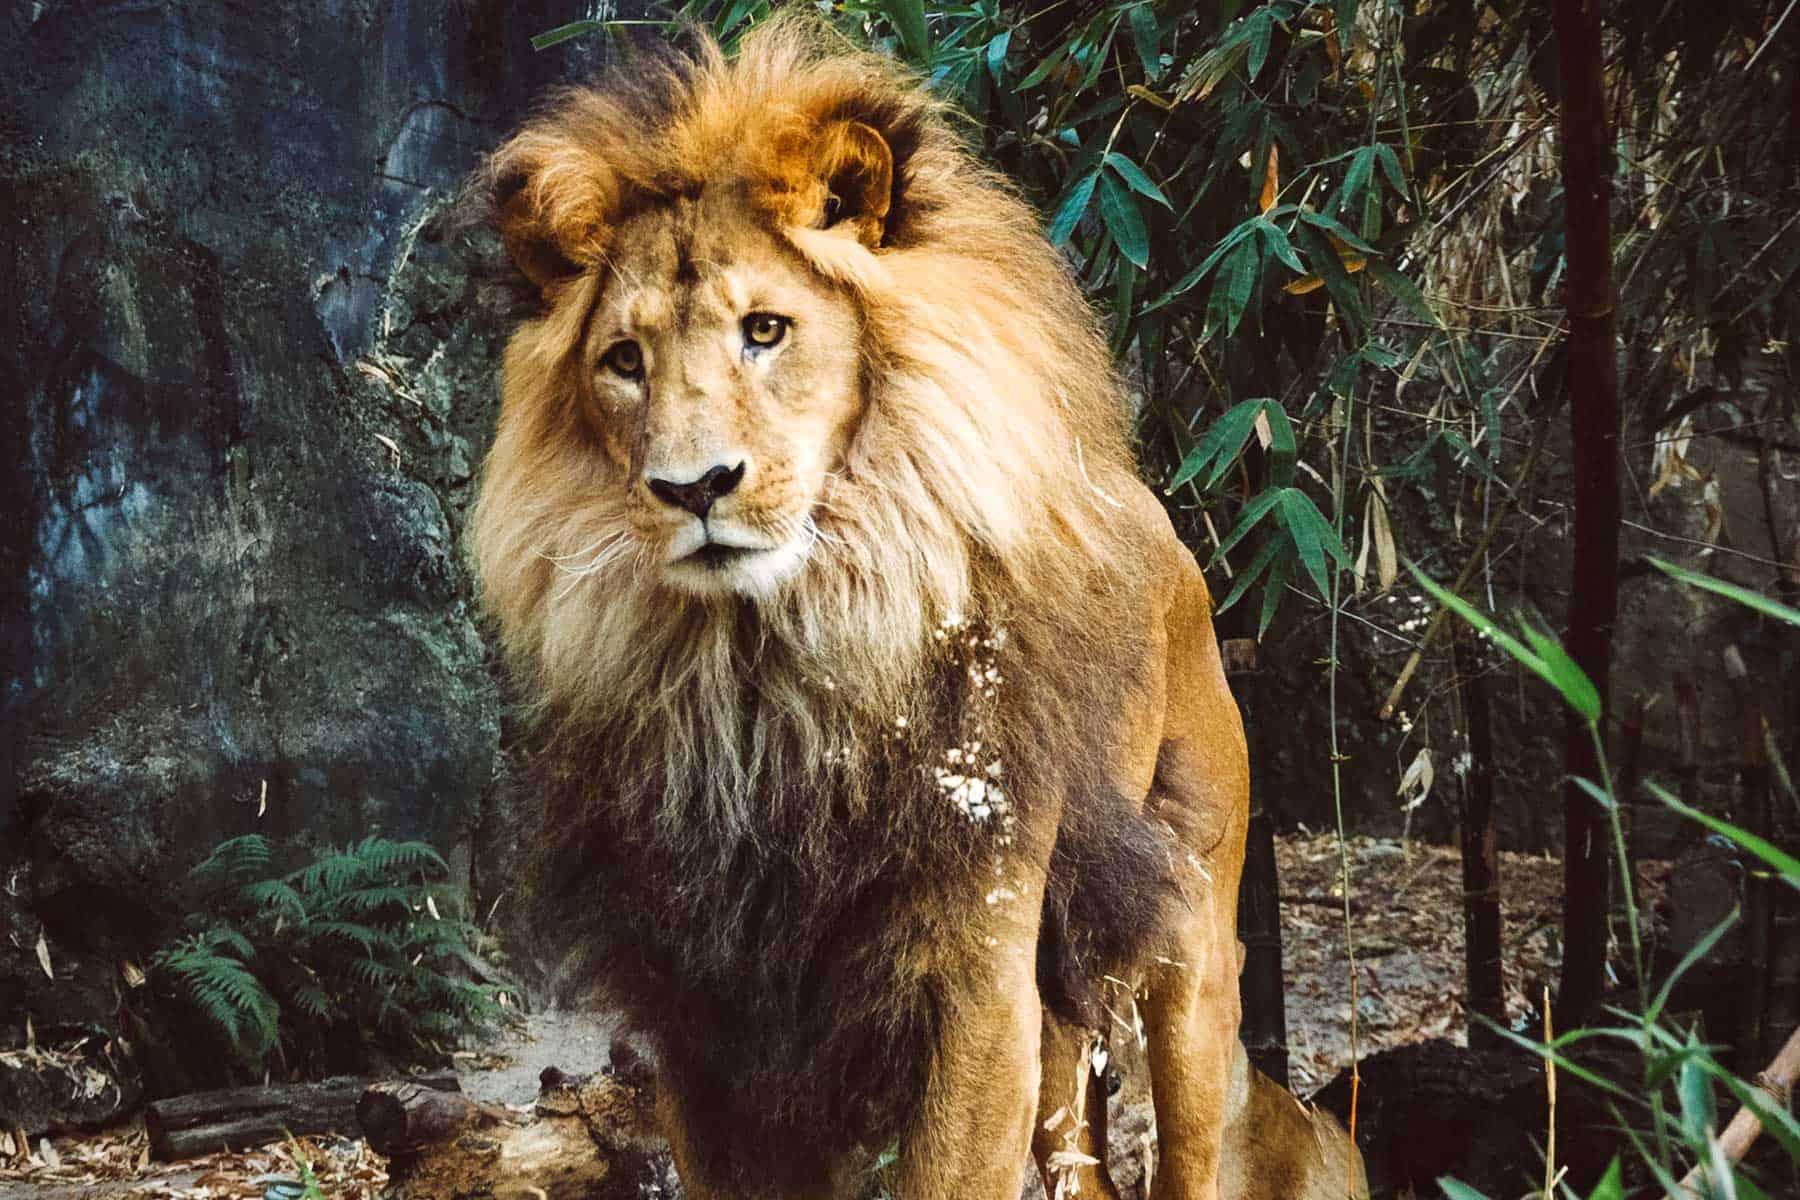 Safariresor_Zambia_Lejon_3_Nygren_Lind_Resebyrå